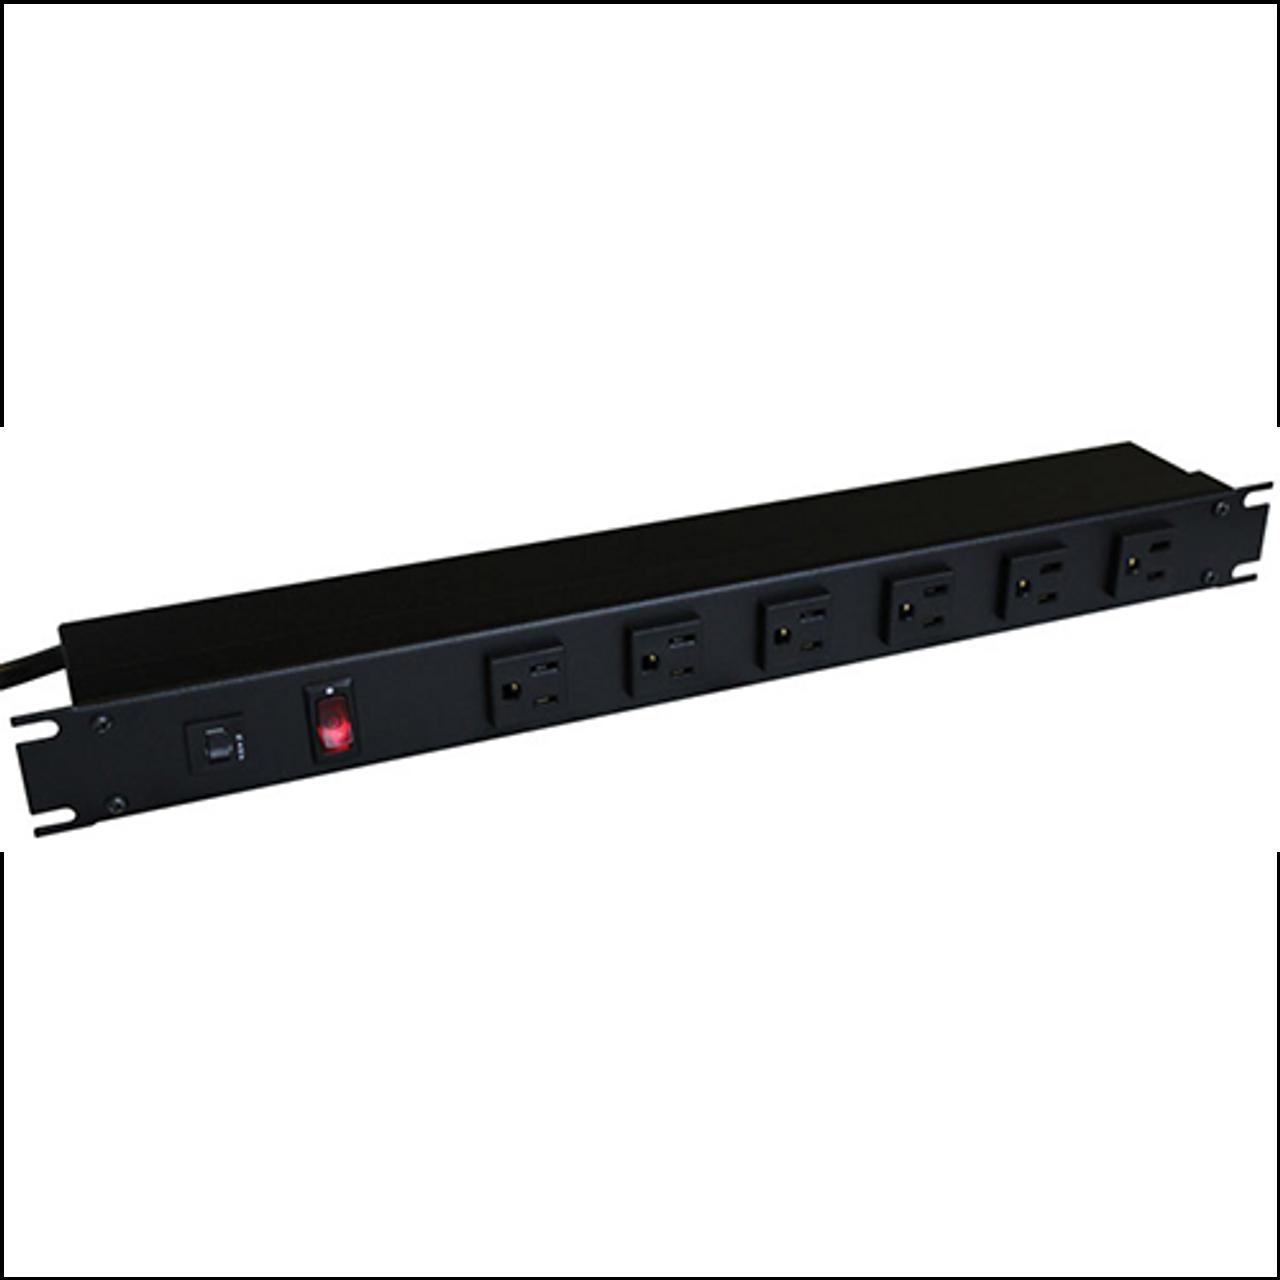 Rack Mount Power Strips 15 20 Amp 30 Amp Remote Access Pdu